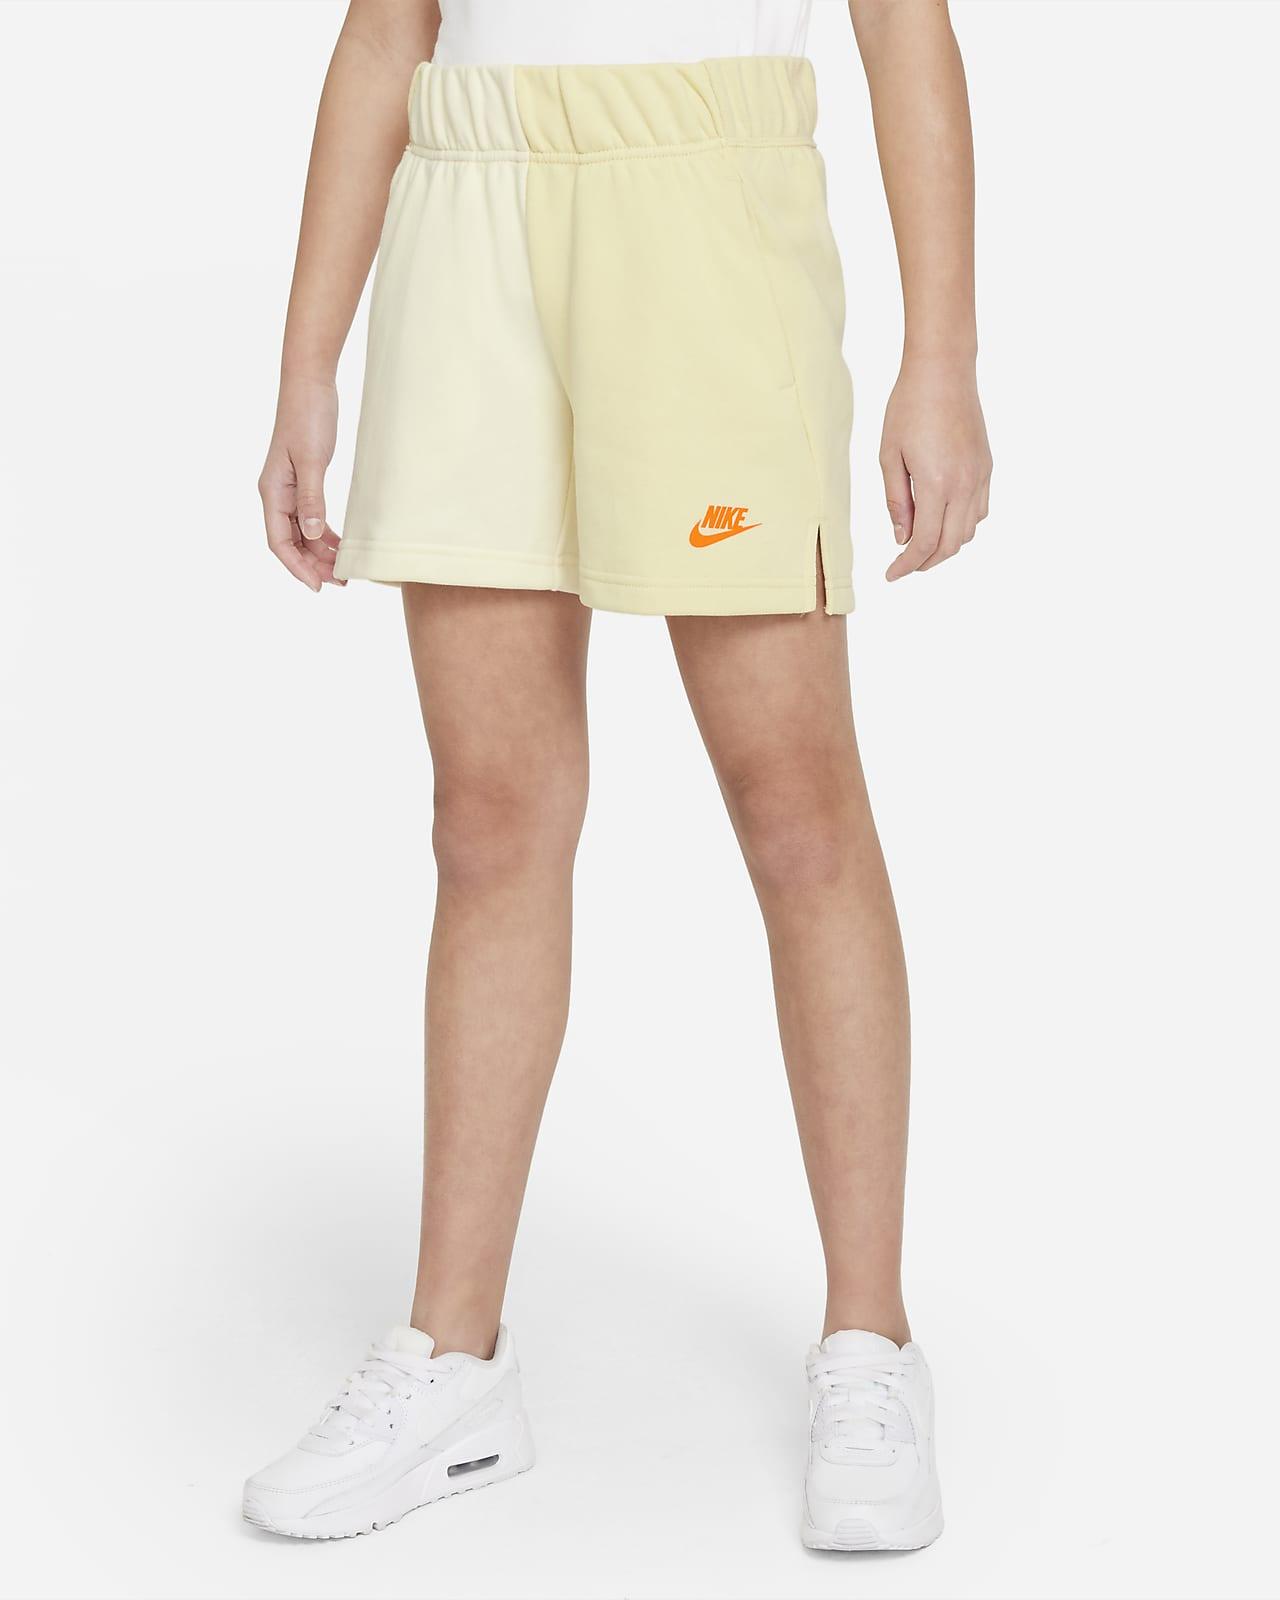 Short en molleton Nike Sportswear pour Fille plus âgée